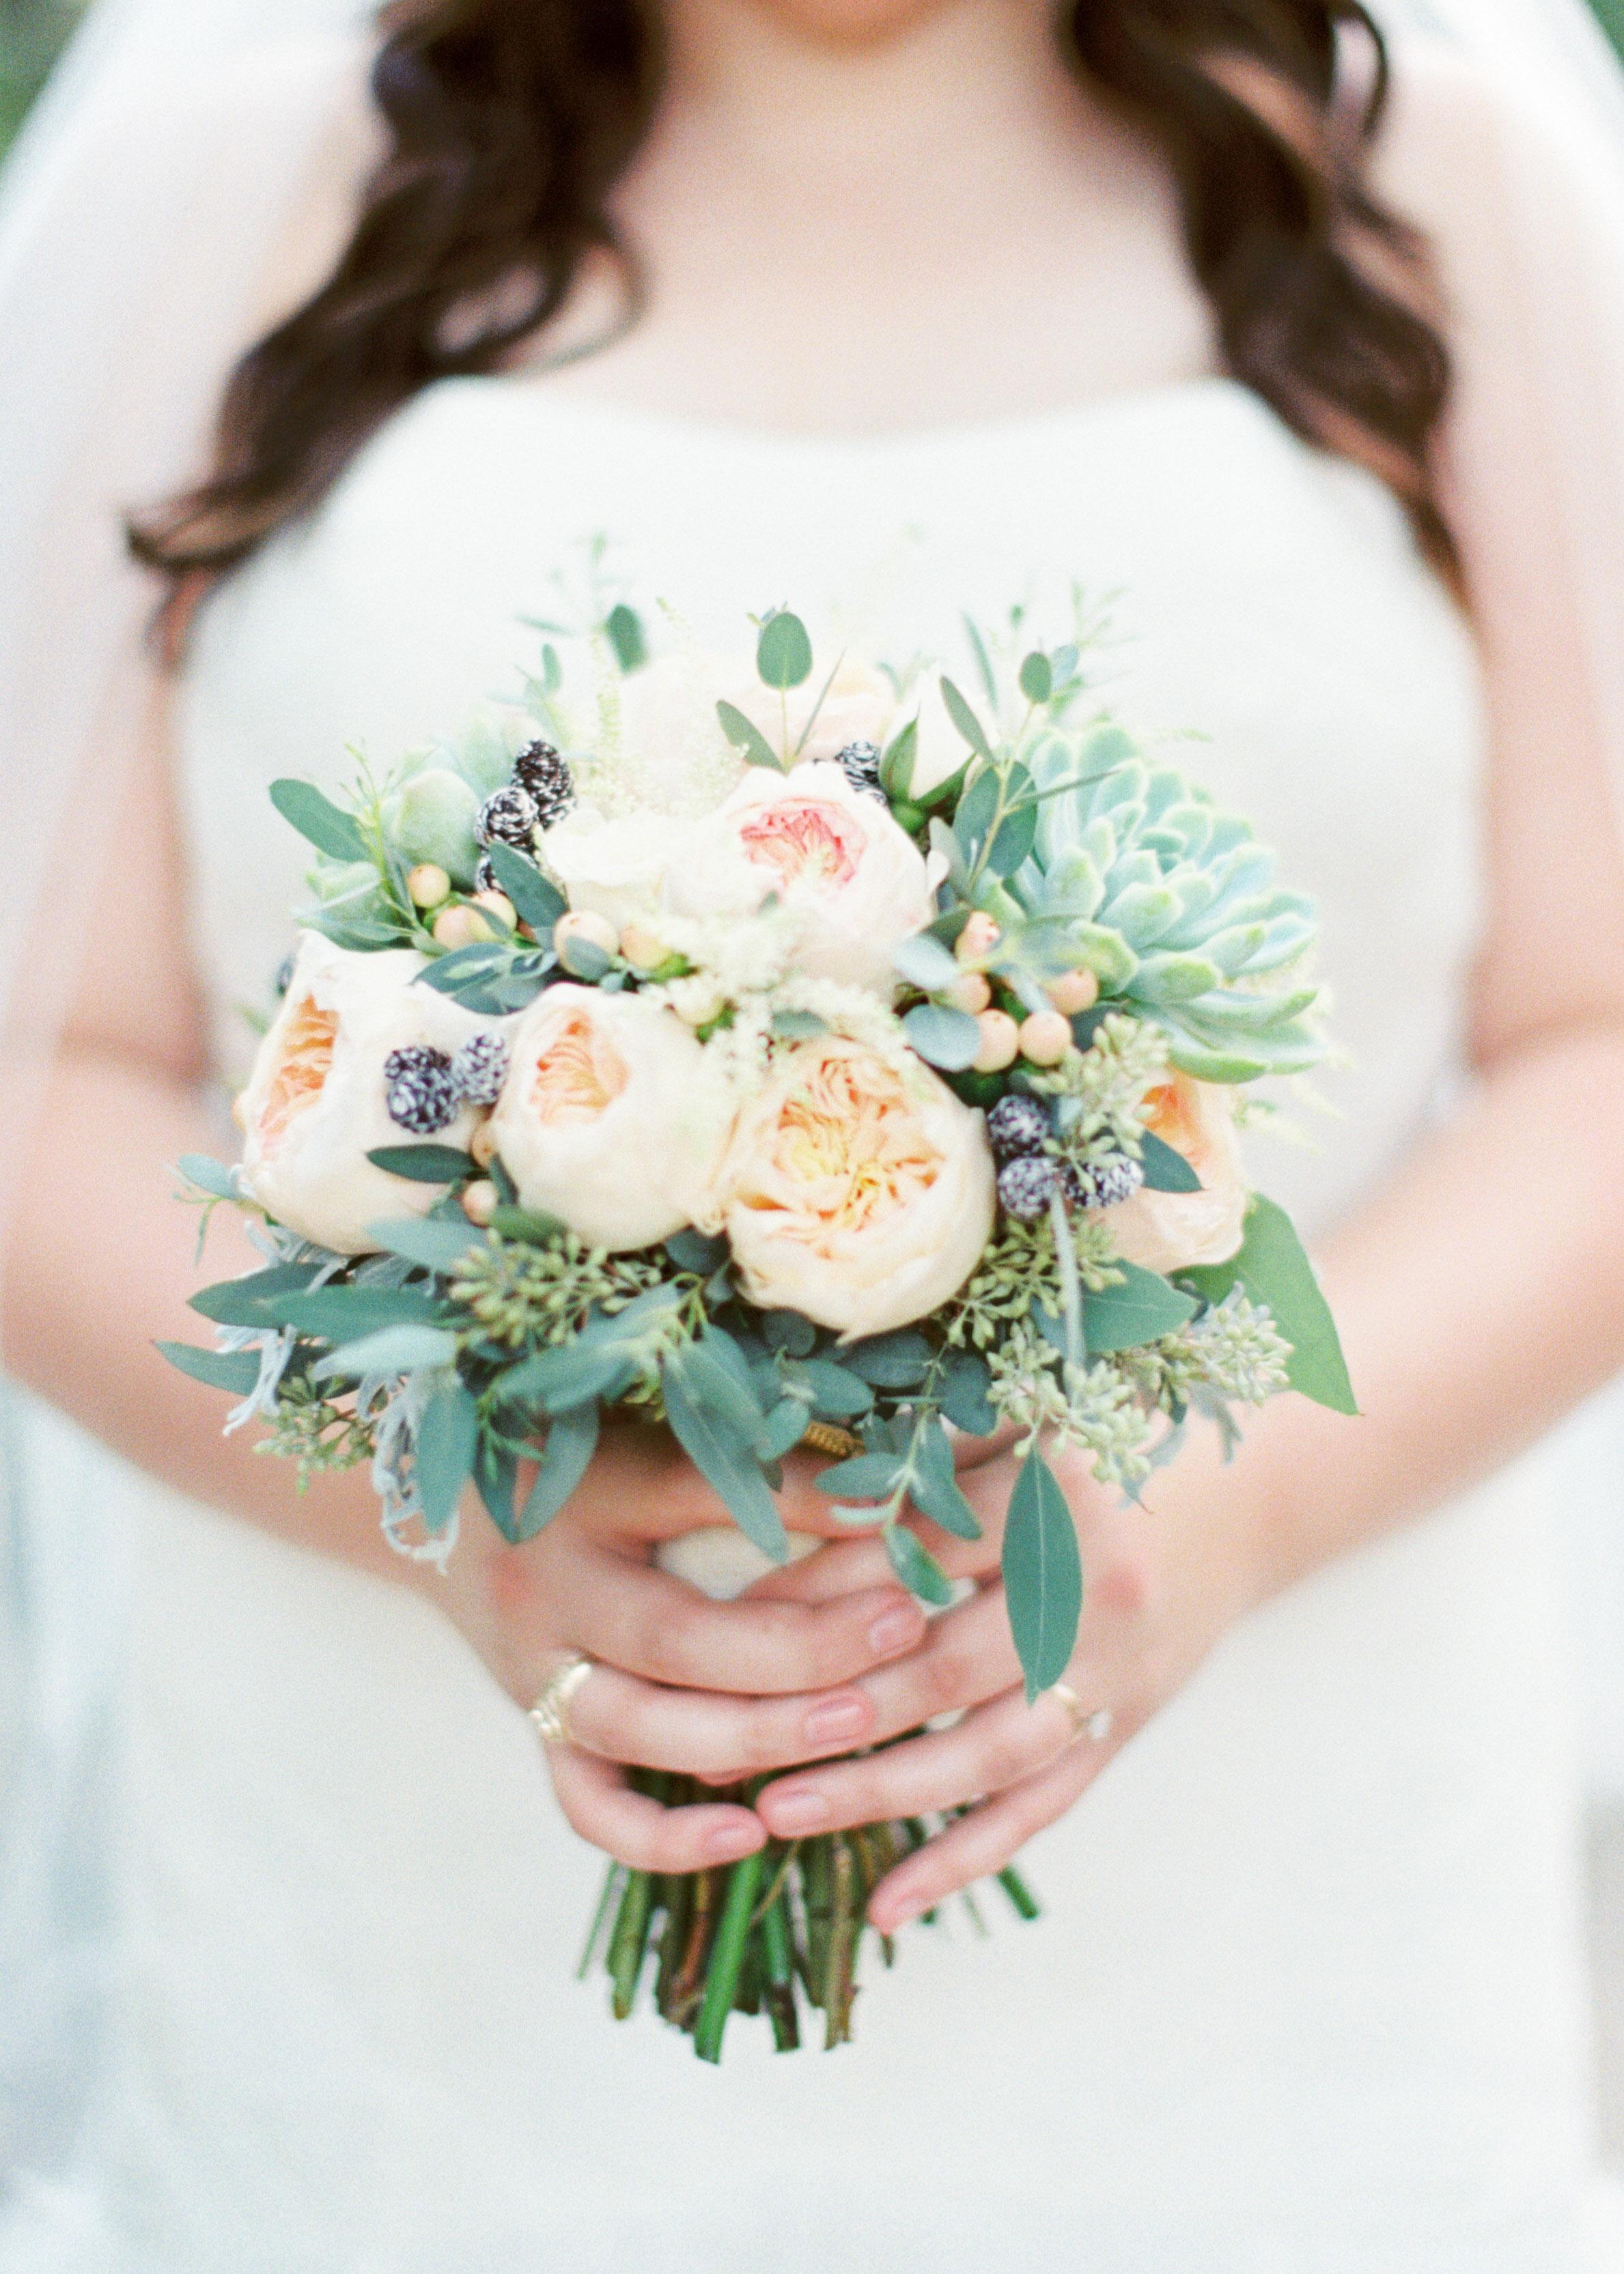 Sarah Best Photography - Elizabeth's Bridals - 7F Lodge-128.jpg